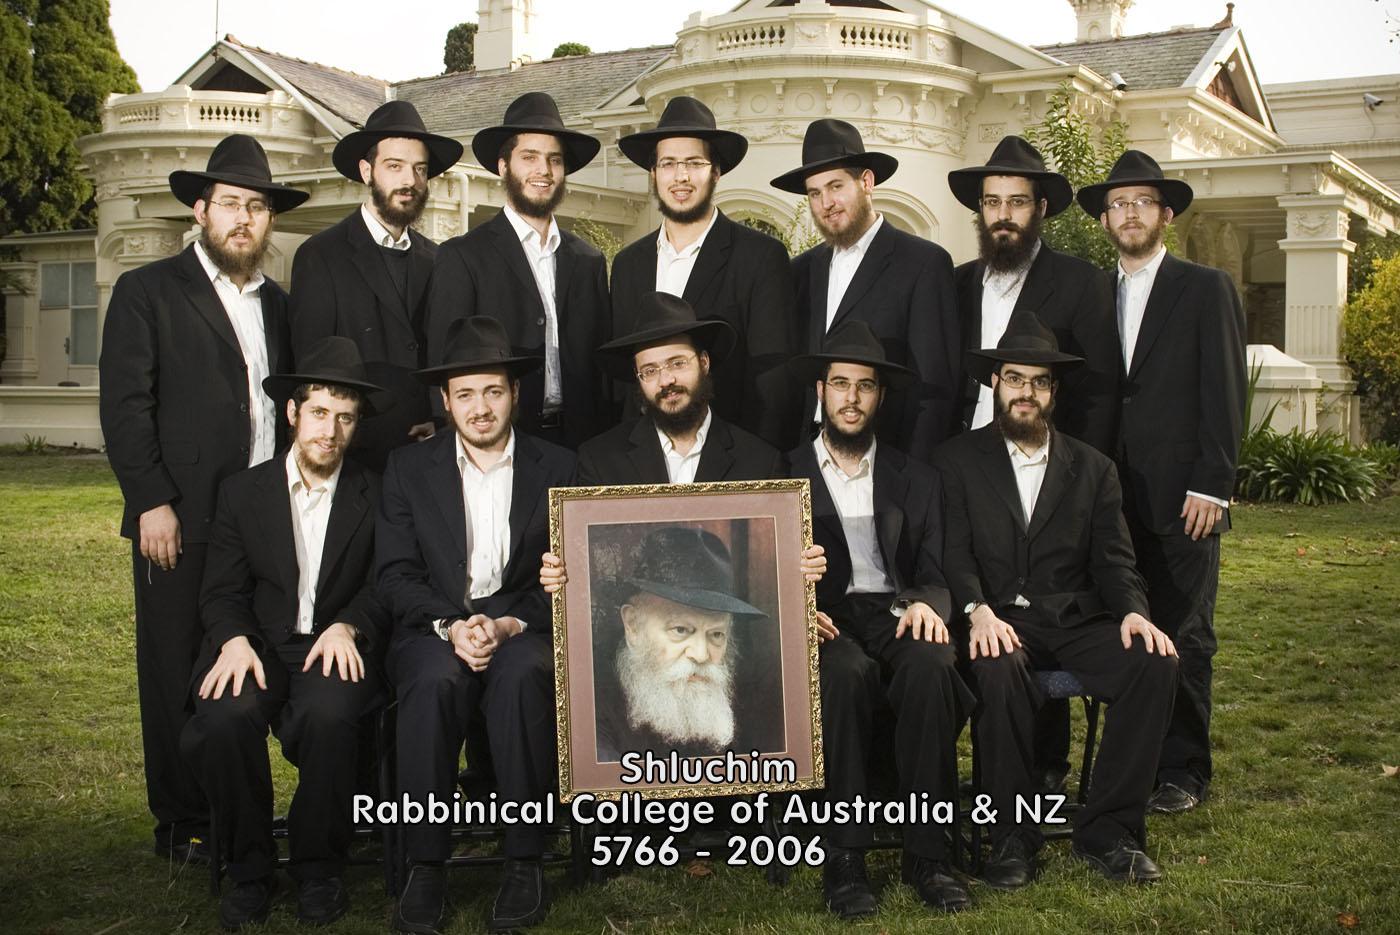 Shluchim - Rabbinical College of Australia & NZ - 5766